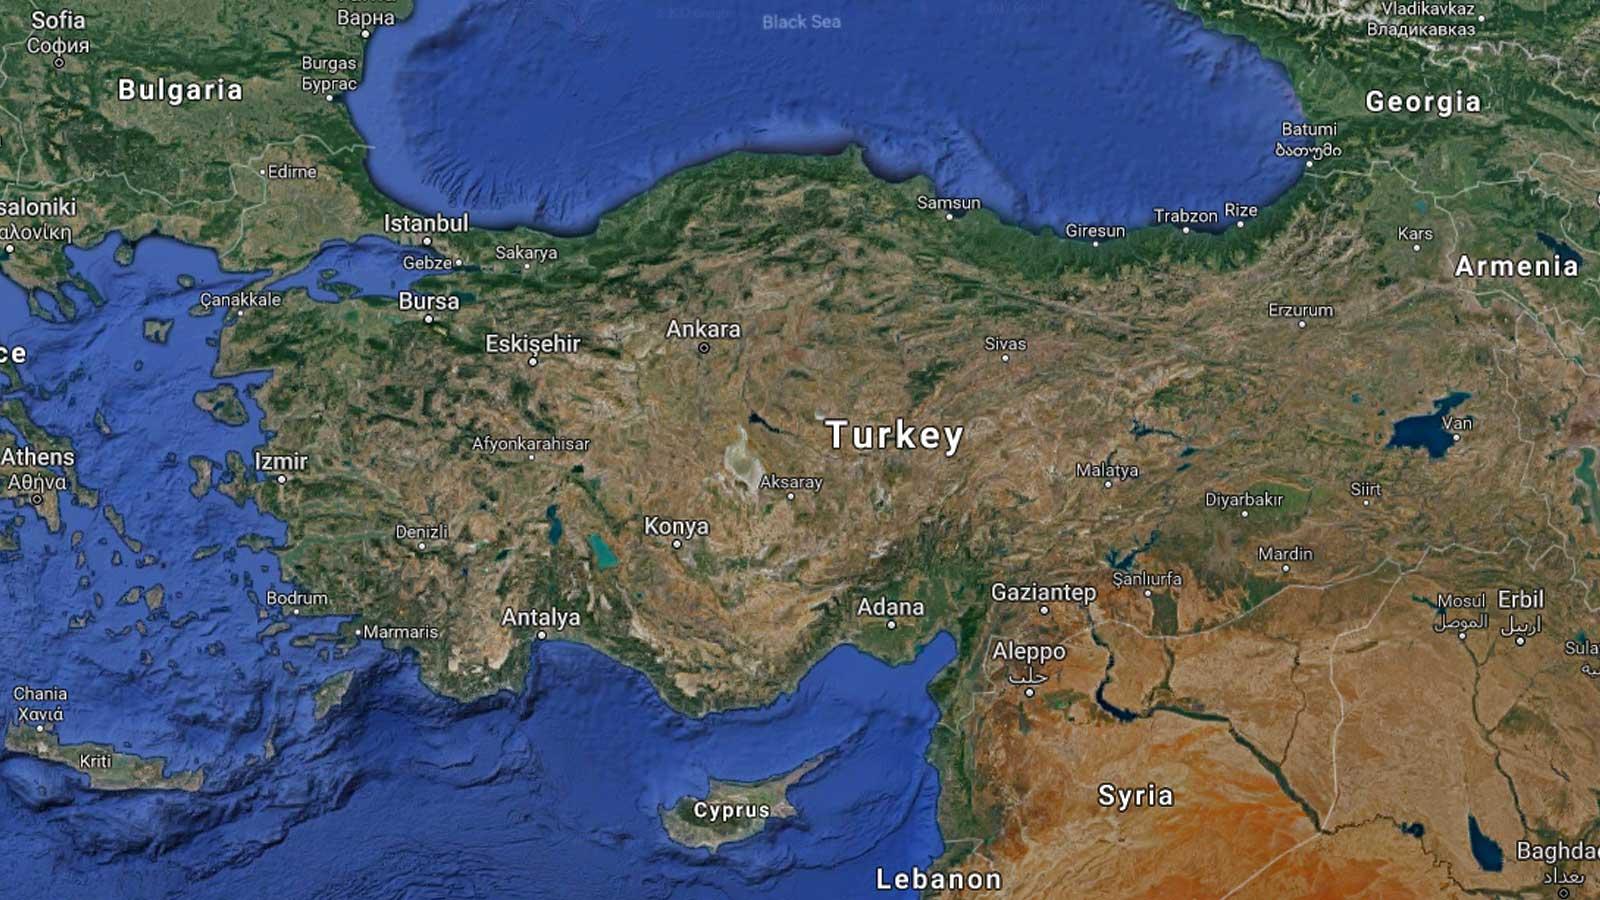 UNESCO World Heritage Sites in Turkey